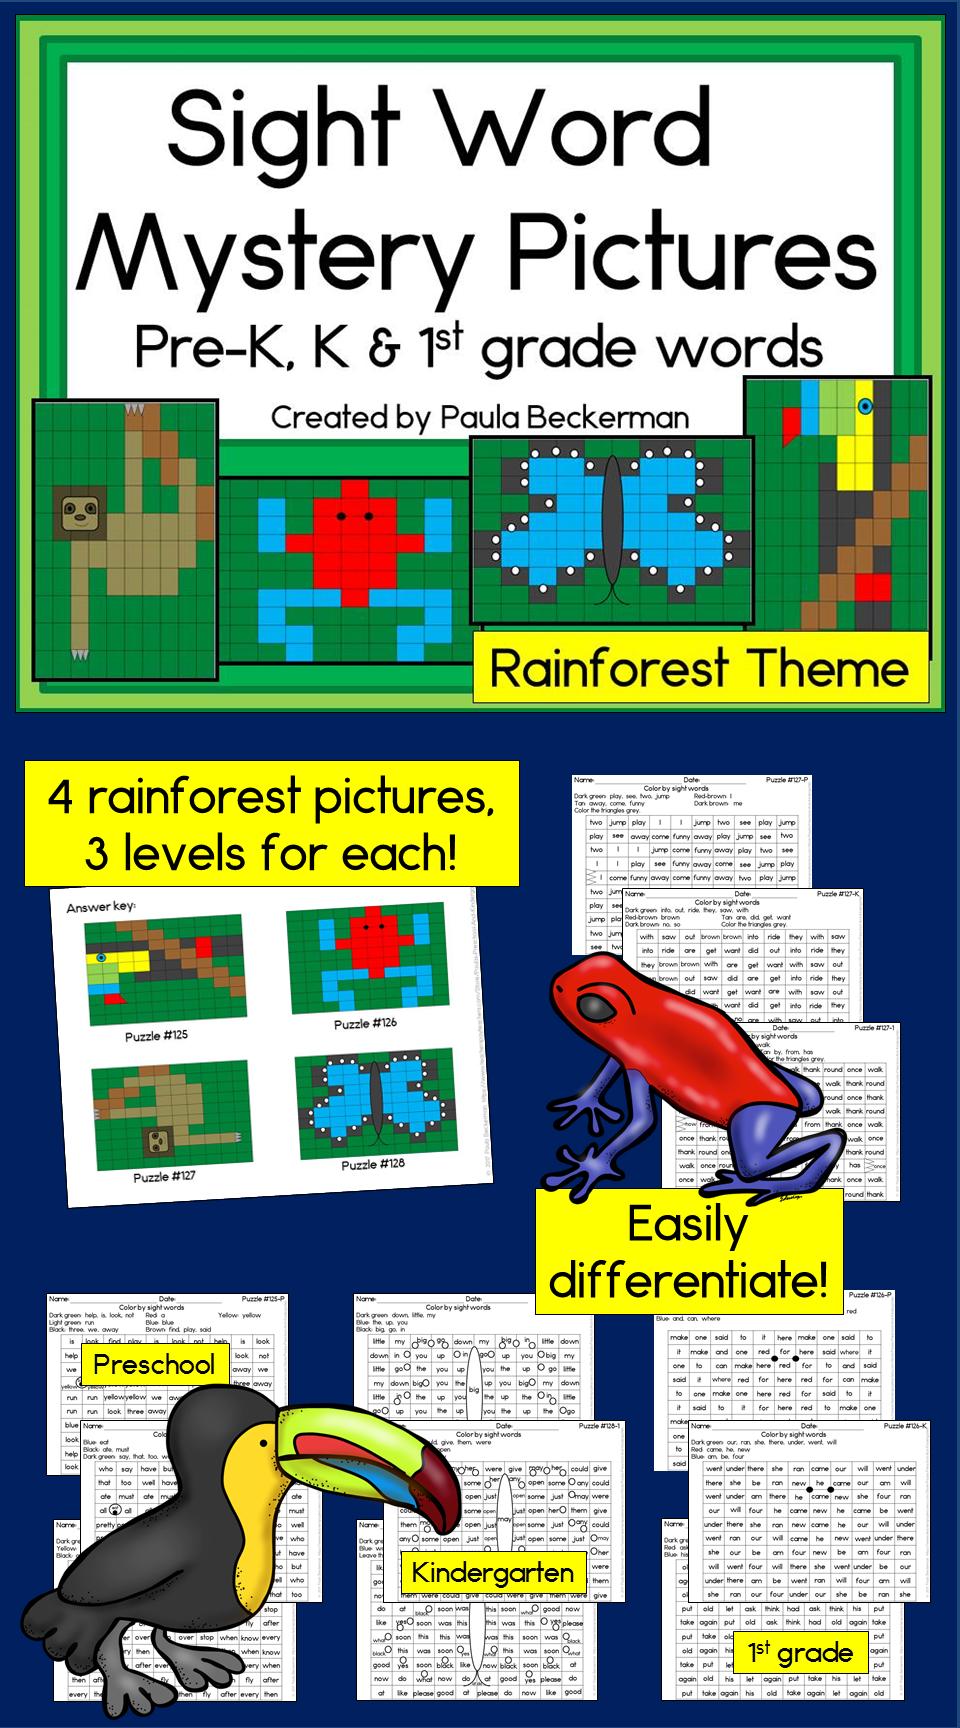 Sight Word Mystery Pictures: Rainforest Theme | Kindergarten ...